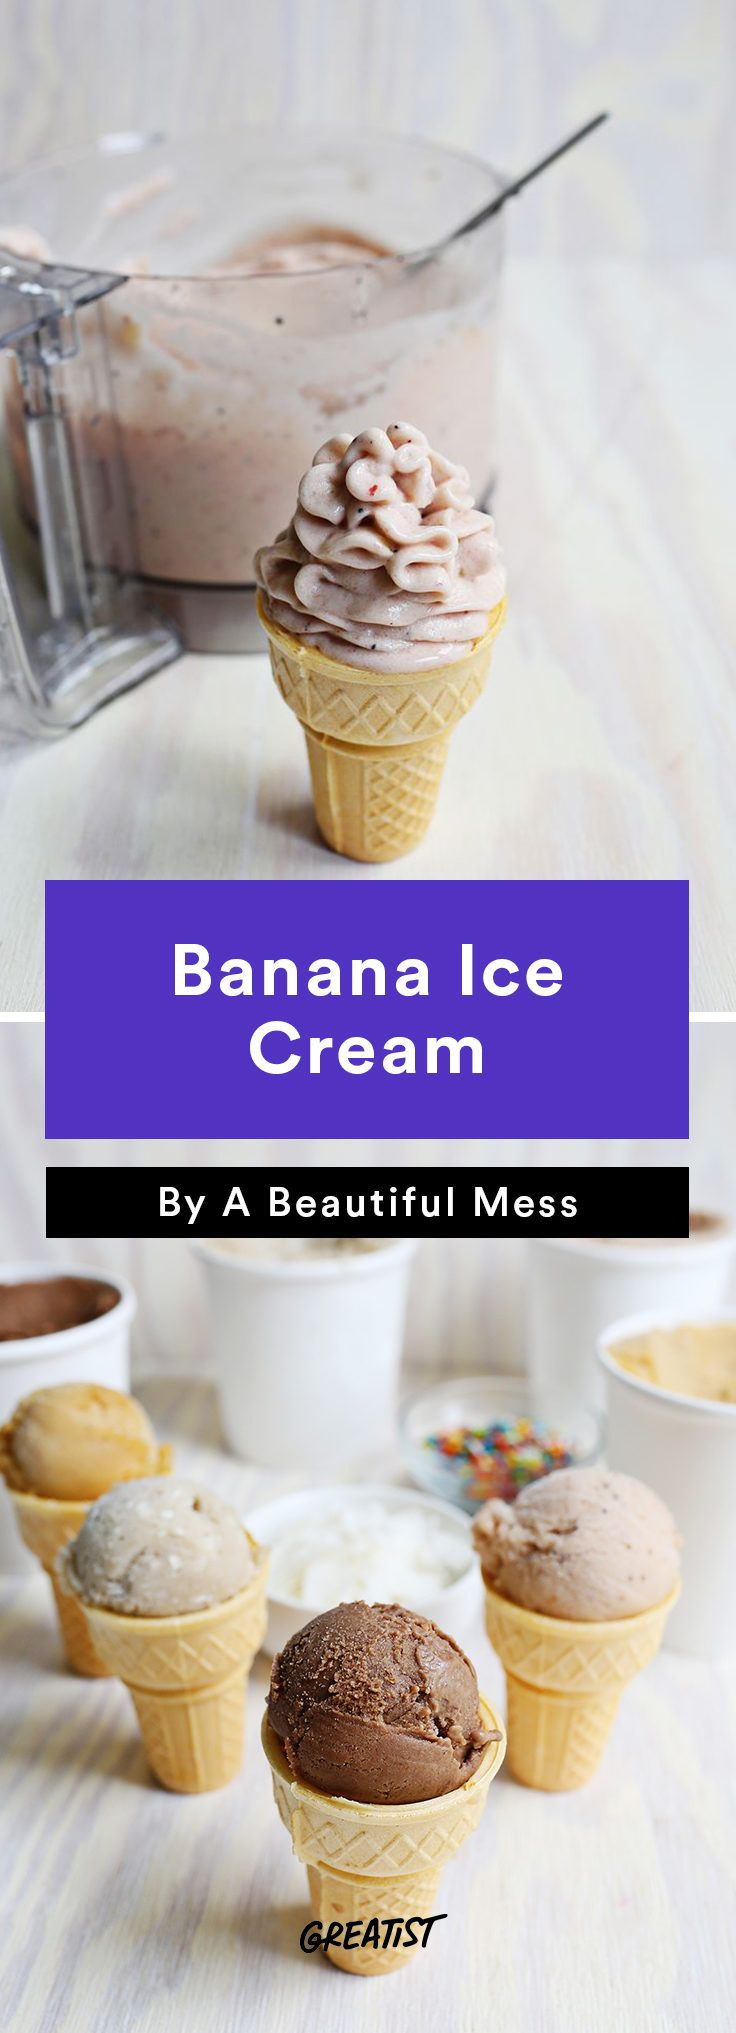 4. Banana Ice Cream #greatist http://greatist.com/eat/easy-three-ingredient-desserts